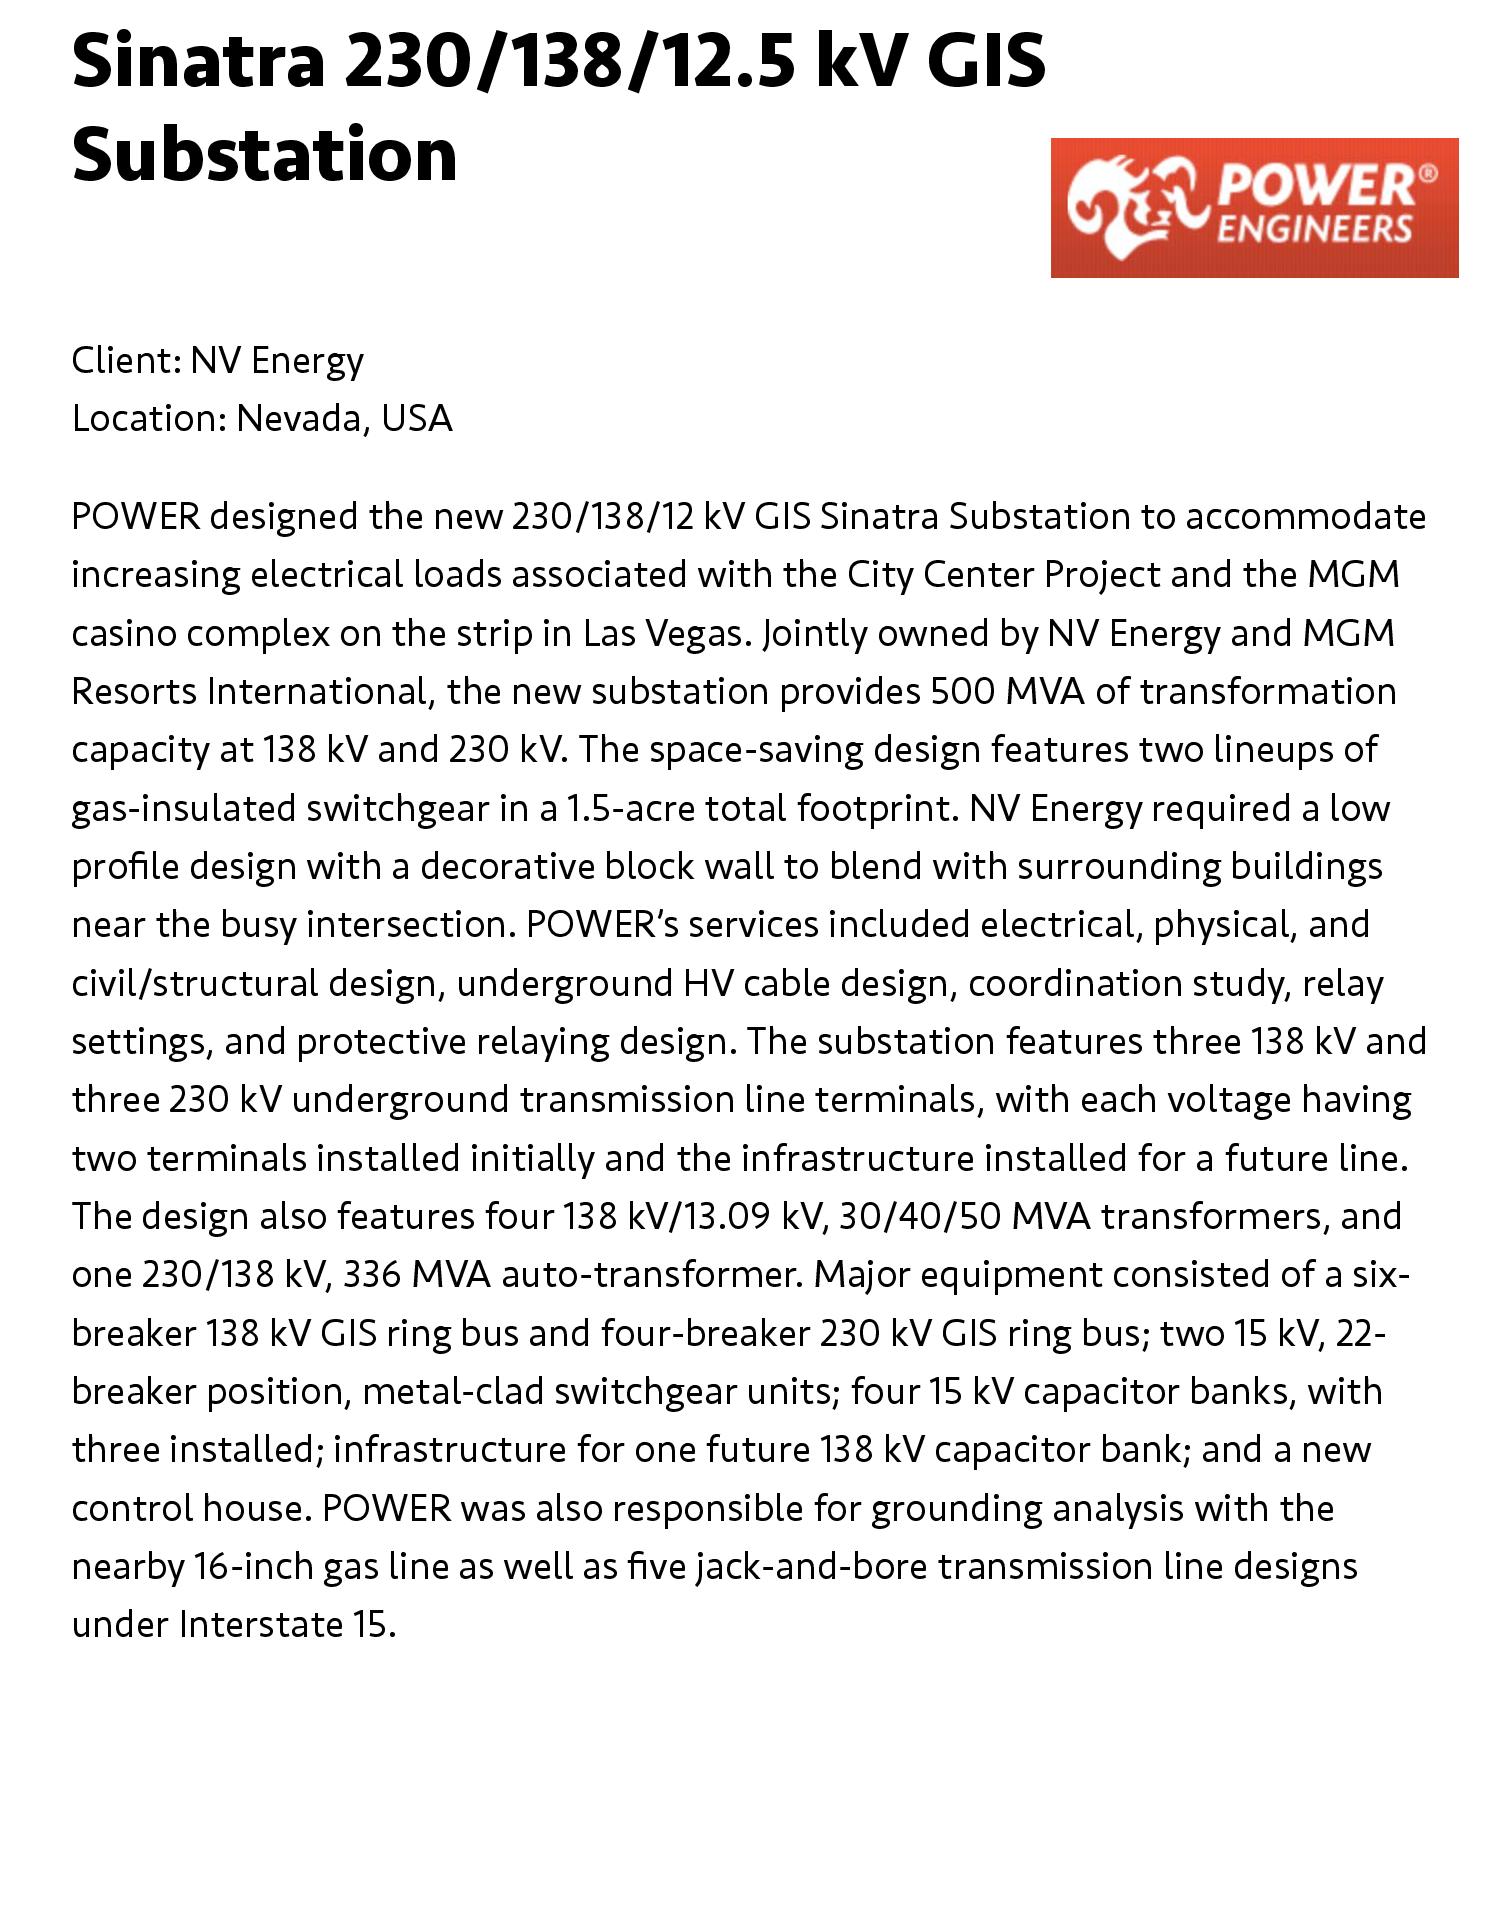 Sinatra 230/138/12 5 kV GIS Substation